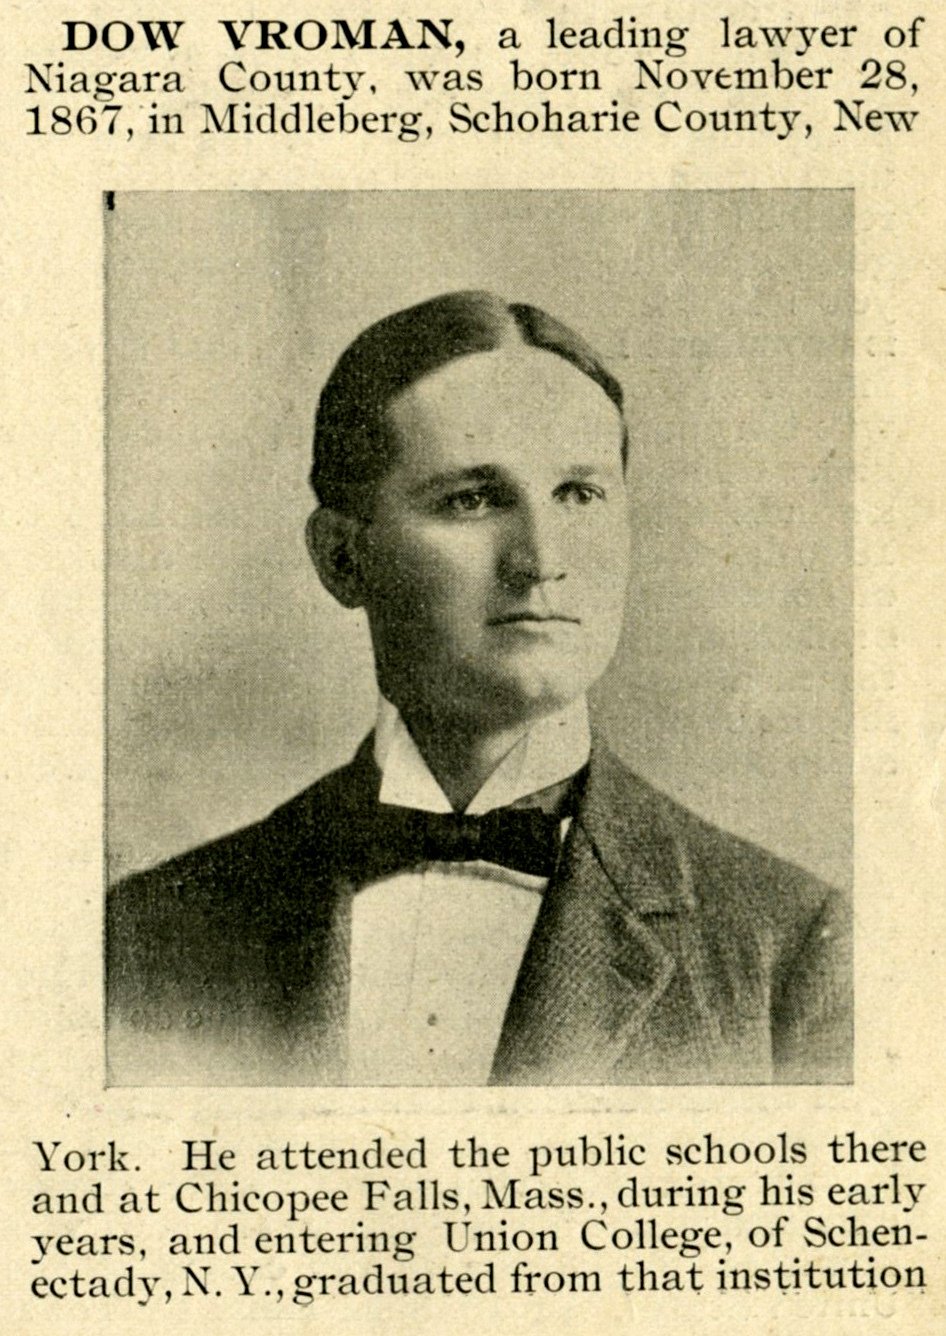 de Kleist lawyer Dow Vroman, photo portrait (HST, c1908).jpg